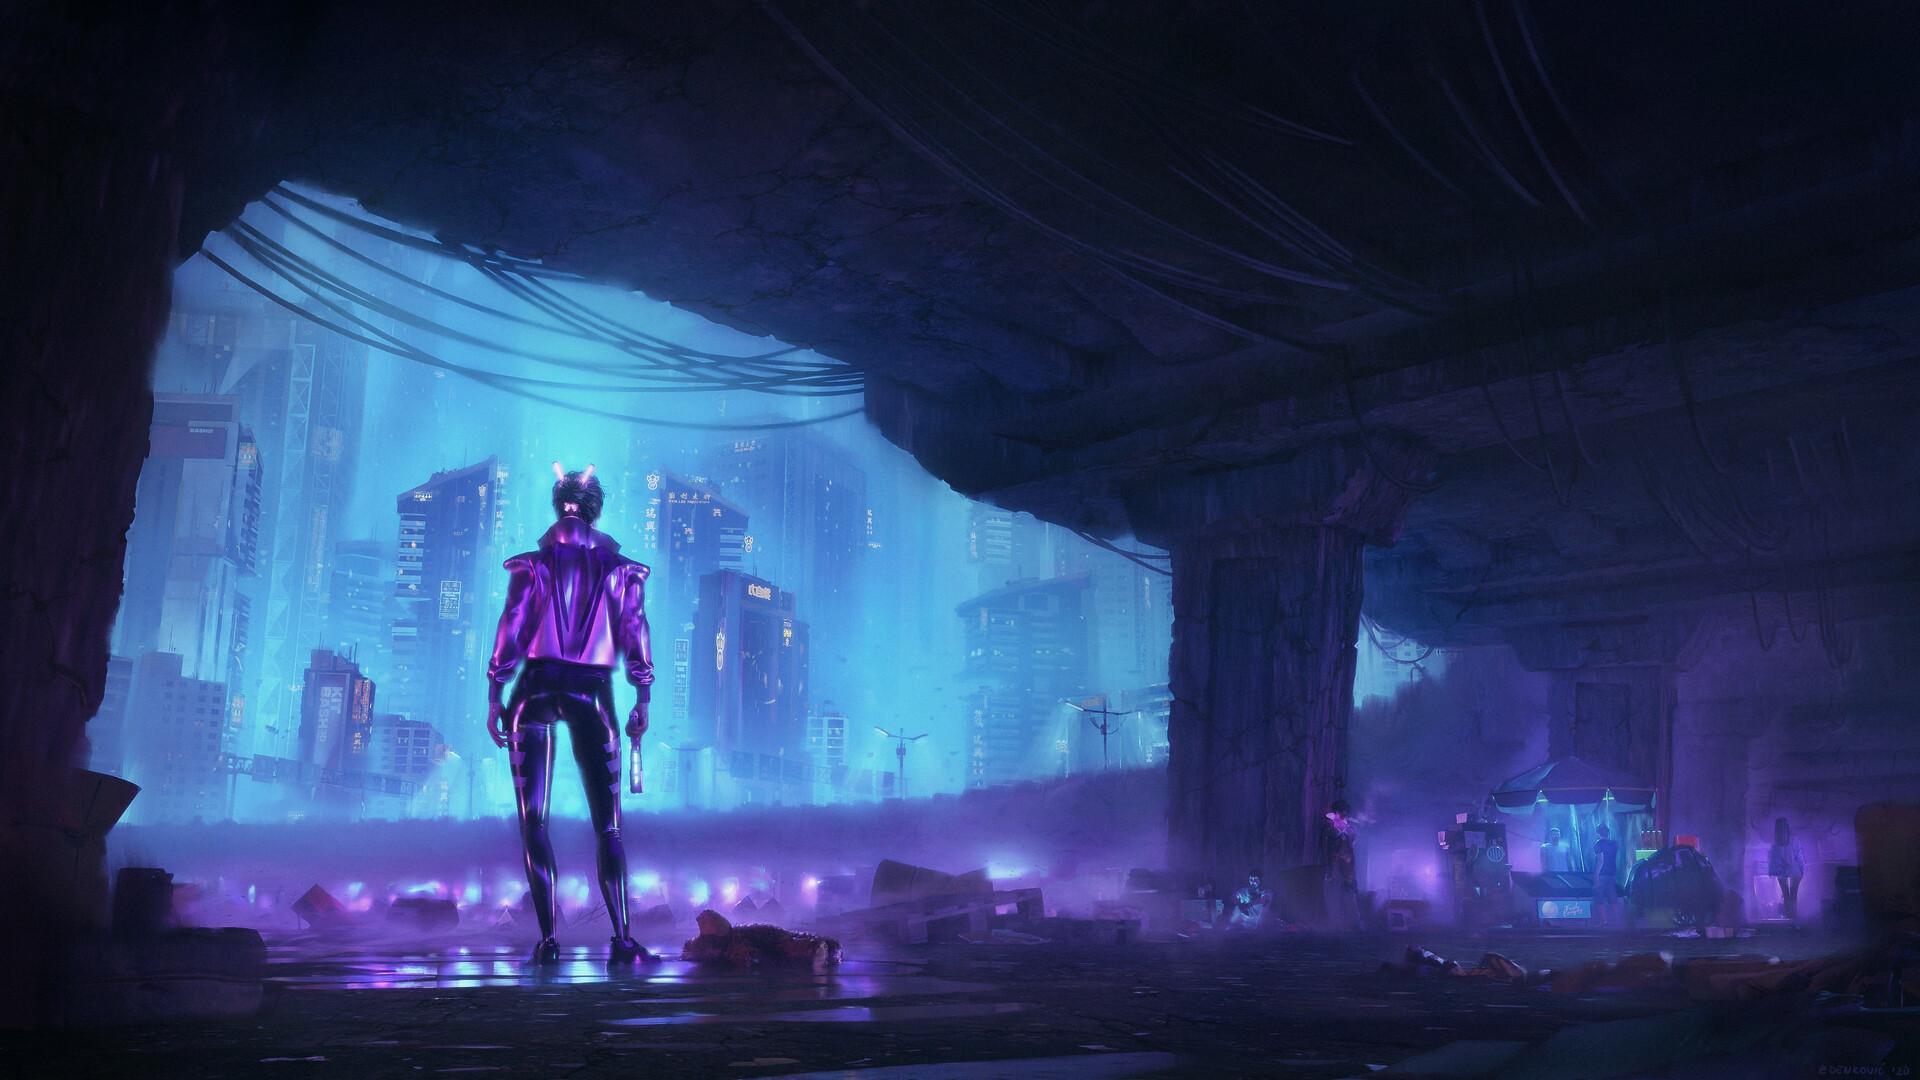 second-life-neon-nights-4k-xt.jpg